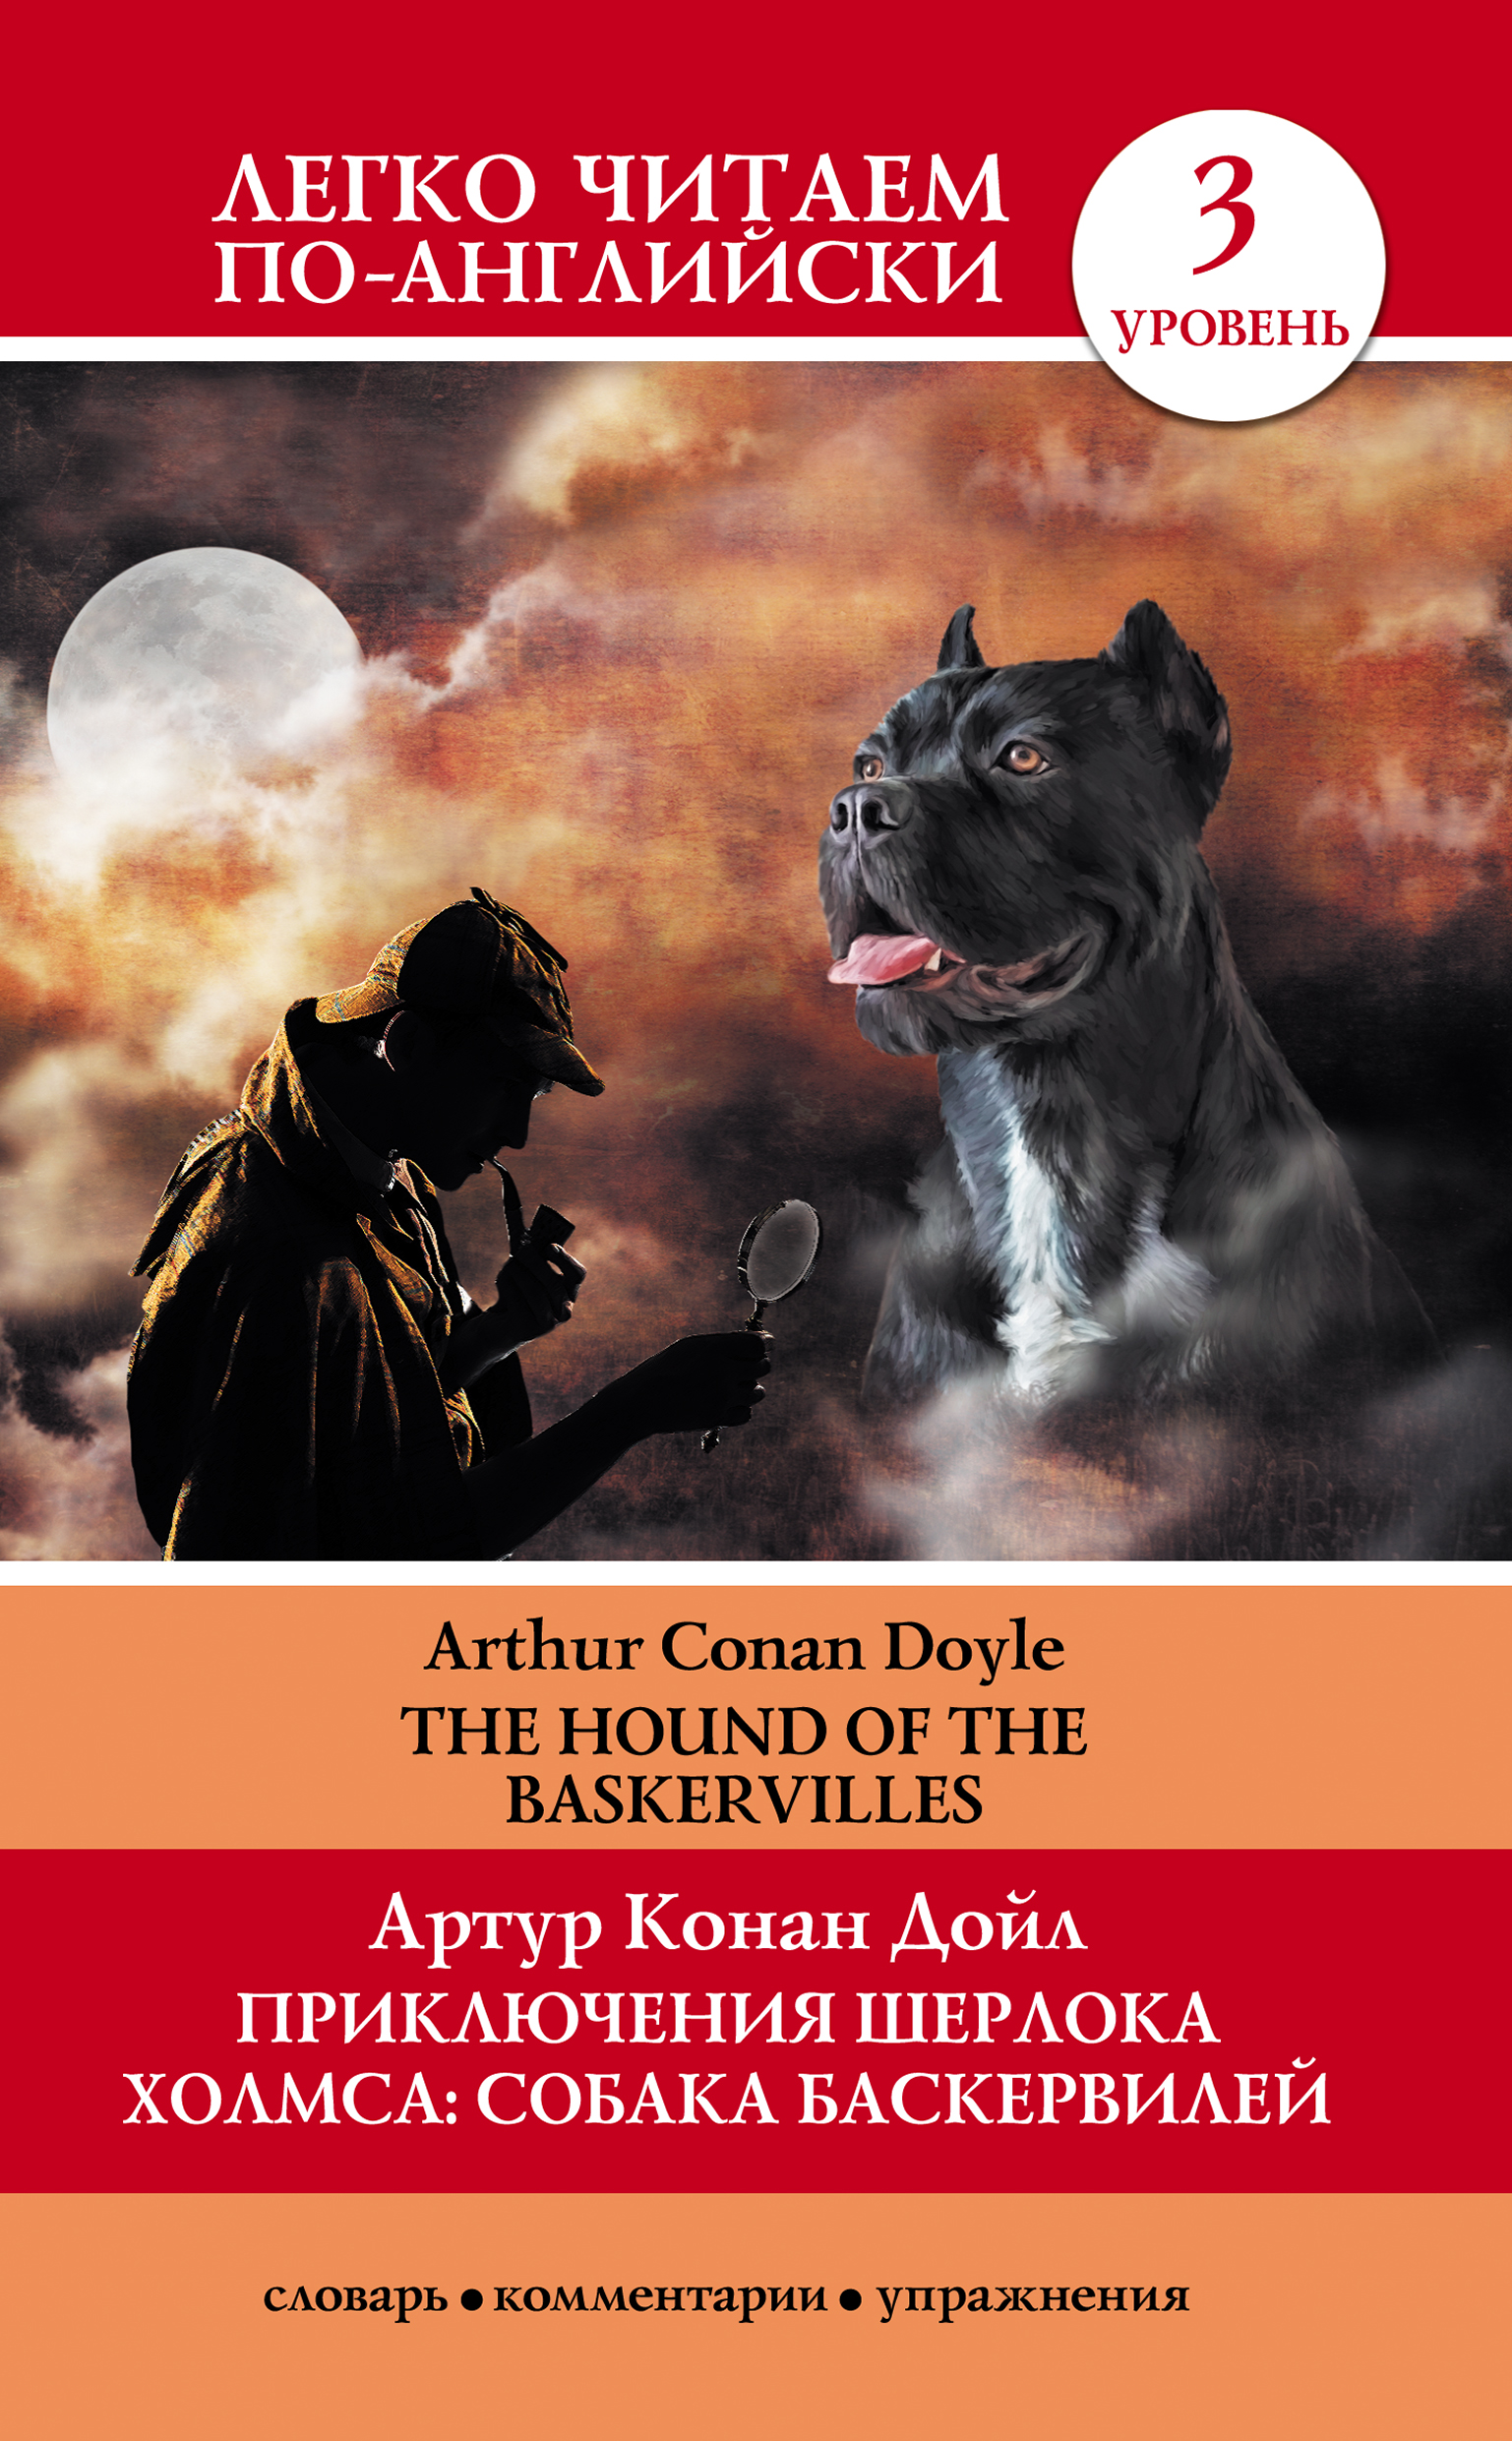 Артур Конан Дойл Приключения Шерлока Холмса: Собака Баскервилей / The Hound of the Baskervilles the hound of the baskervilles cd rom